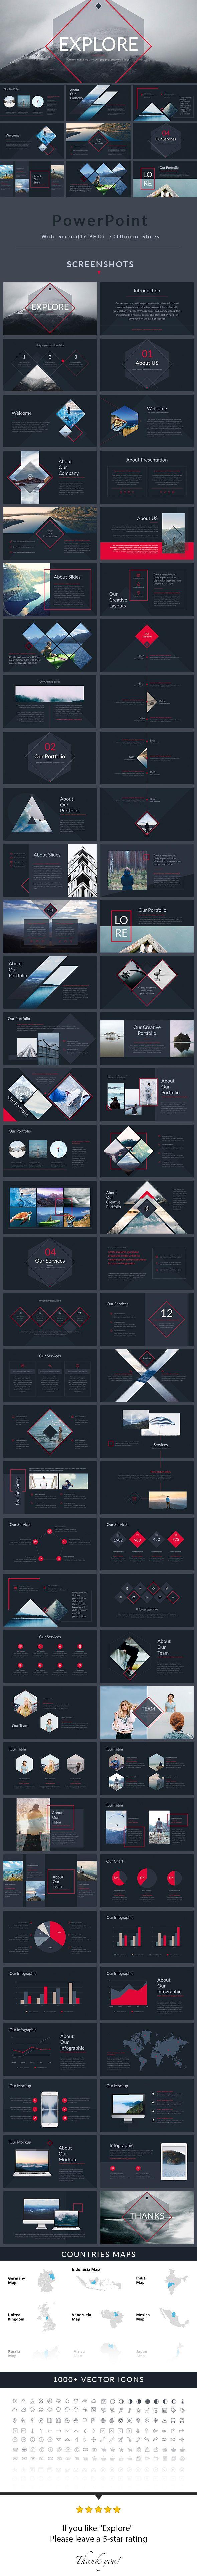 Explore - PowerPoint Presentation Template